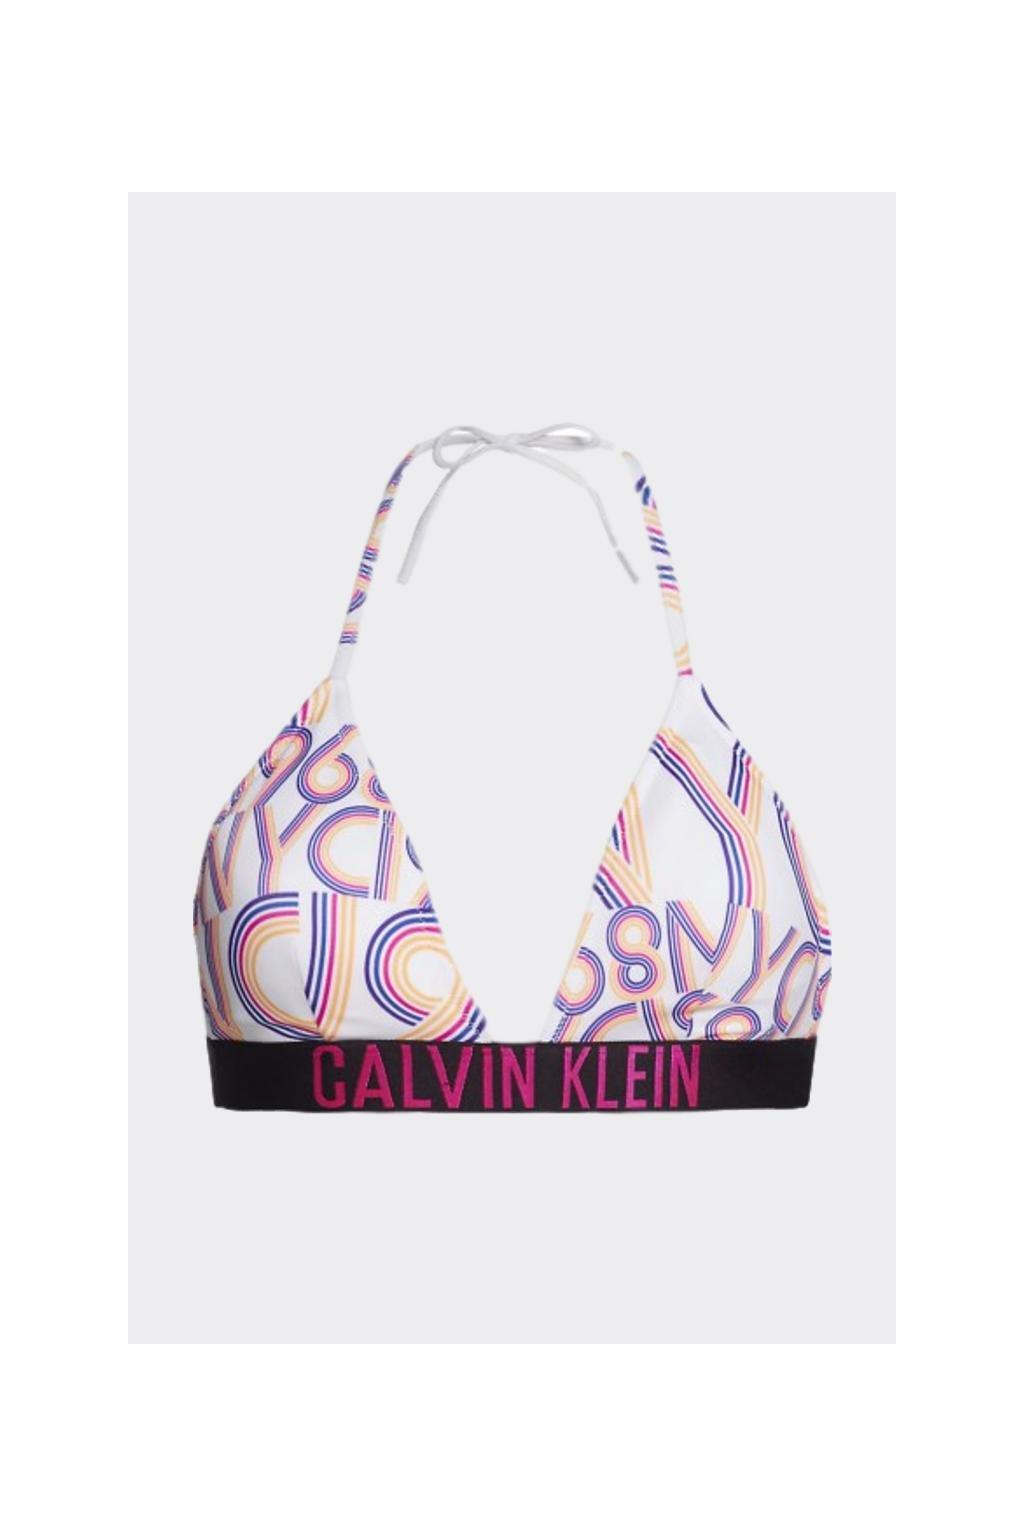 Calvin Klein Intense Power Triangle vrchní díl plavek - bílá s potiskem